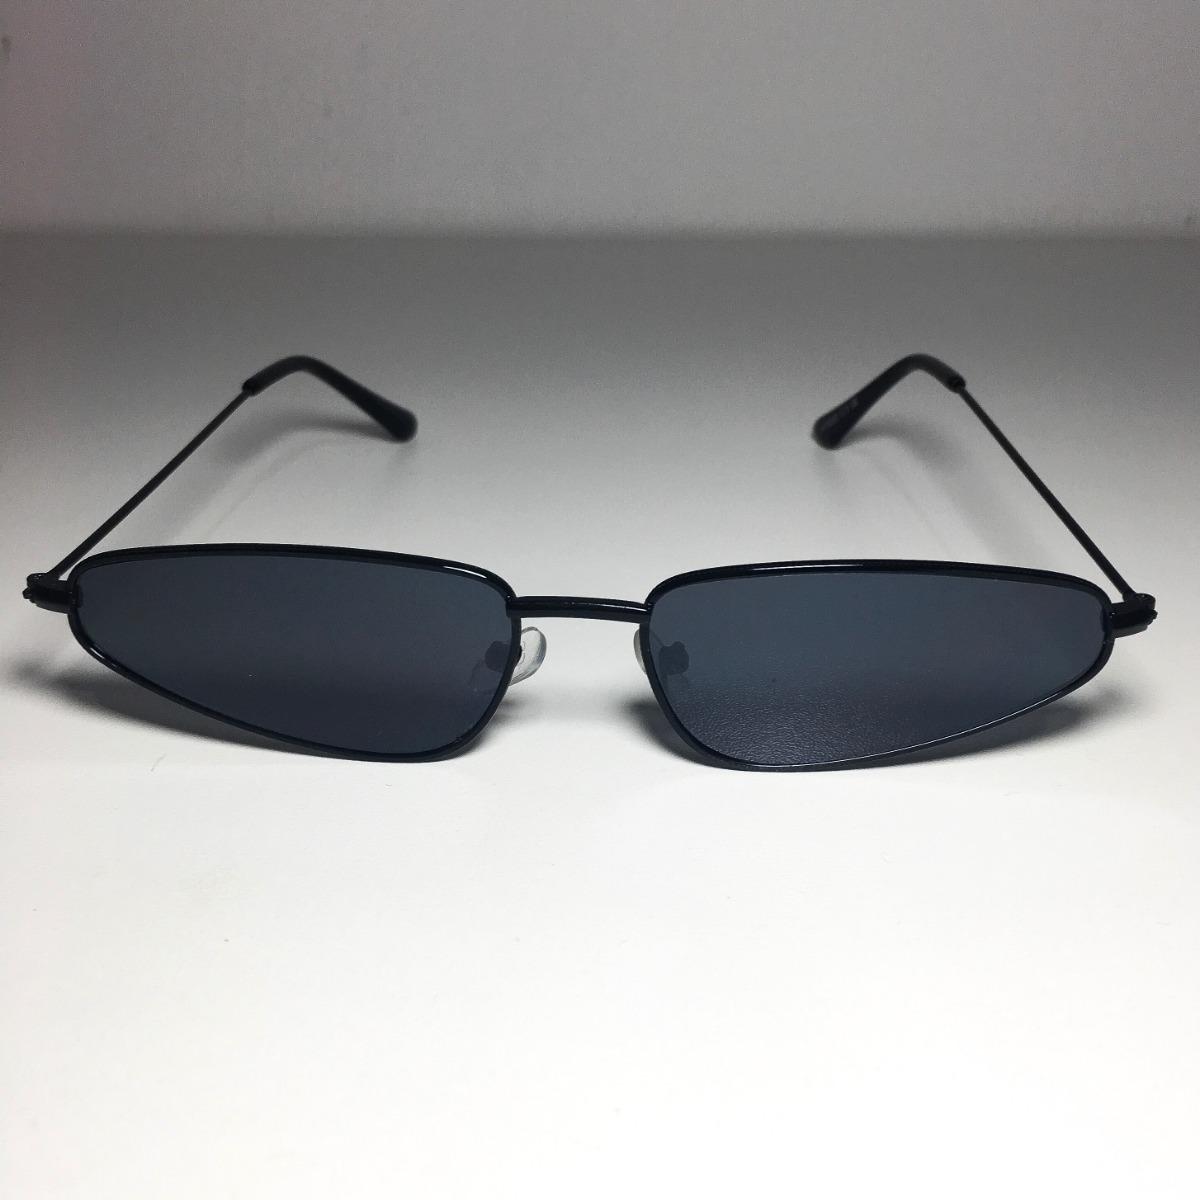 e008c75b7f23e óculos oval de sol pequeno retro vintage estiloso unidade. Carregando zoom.